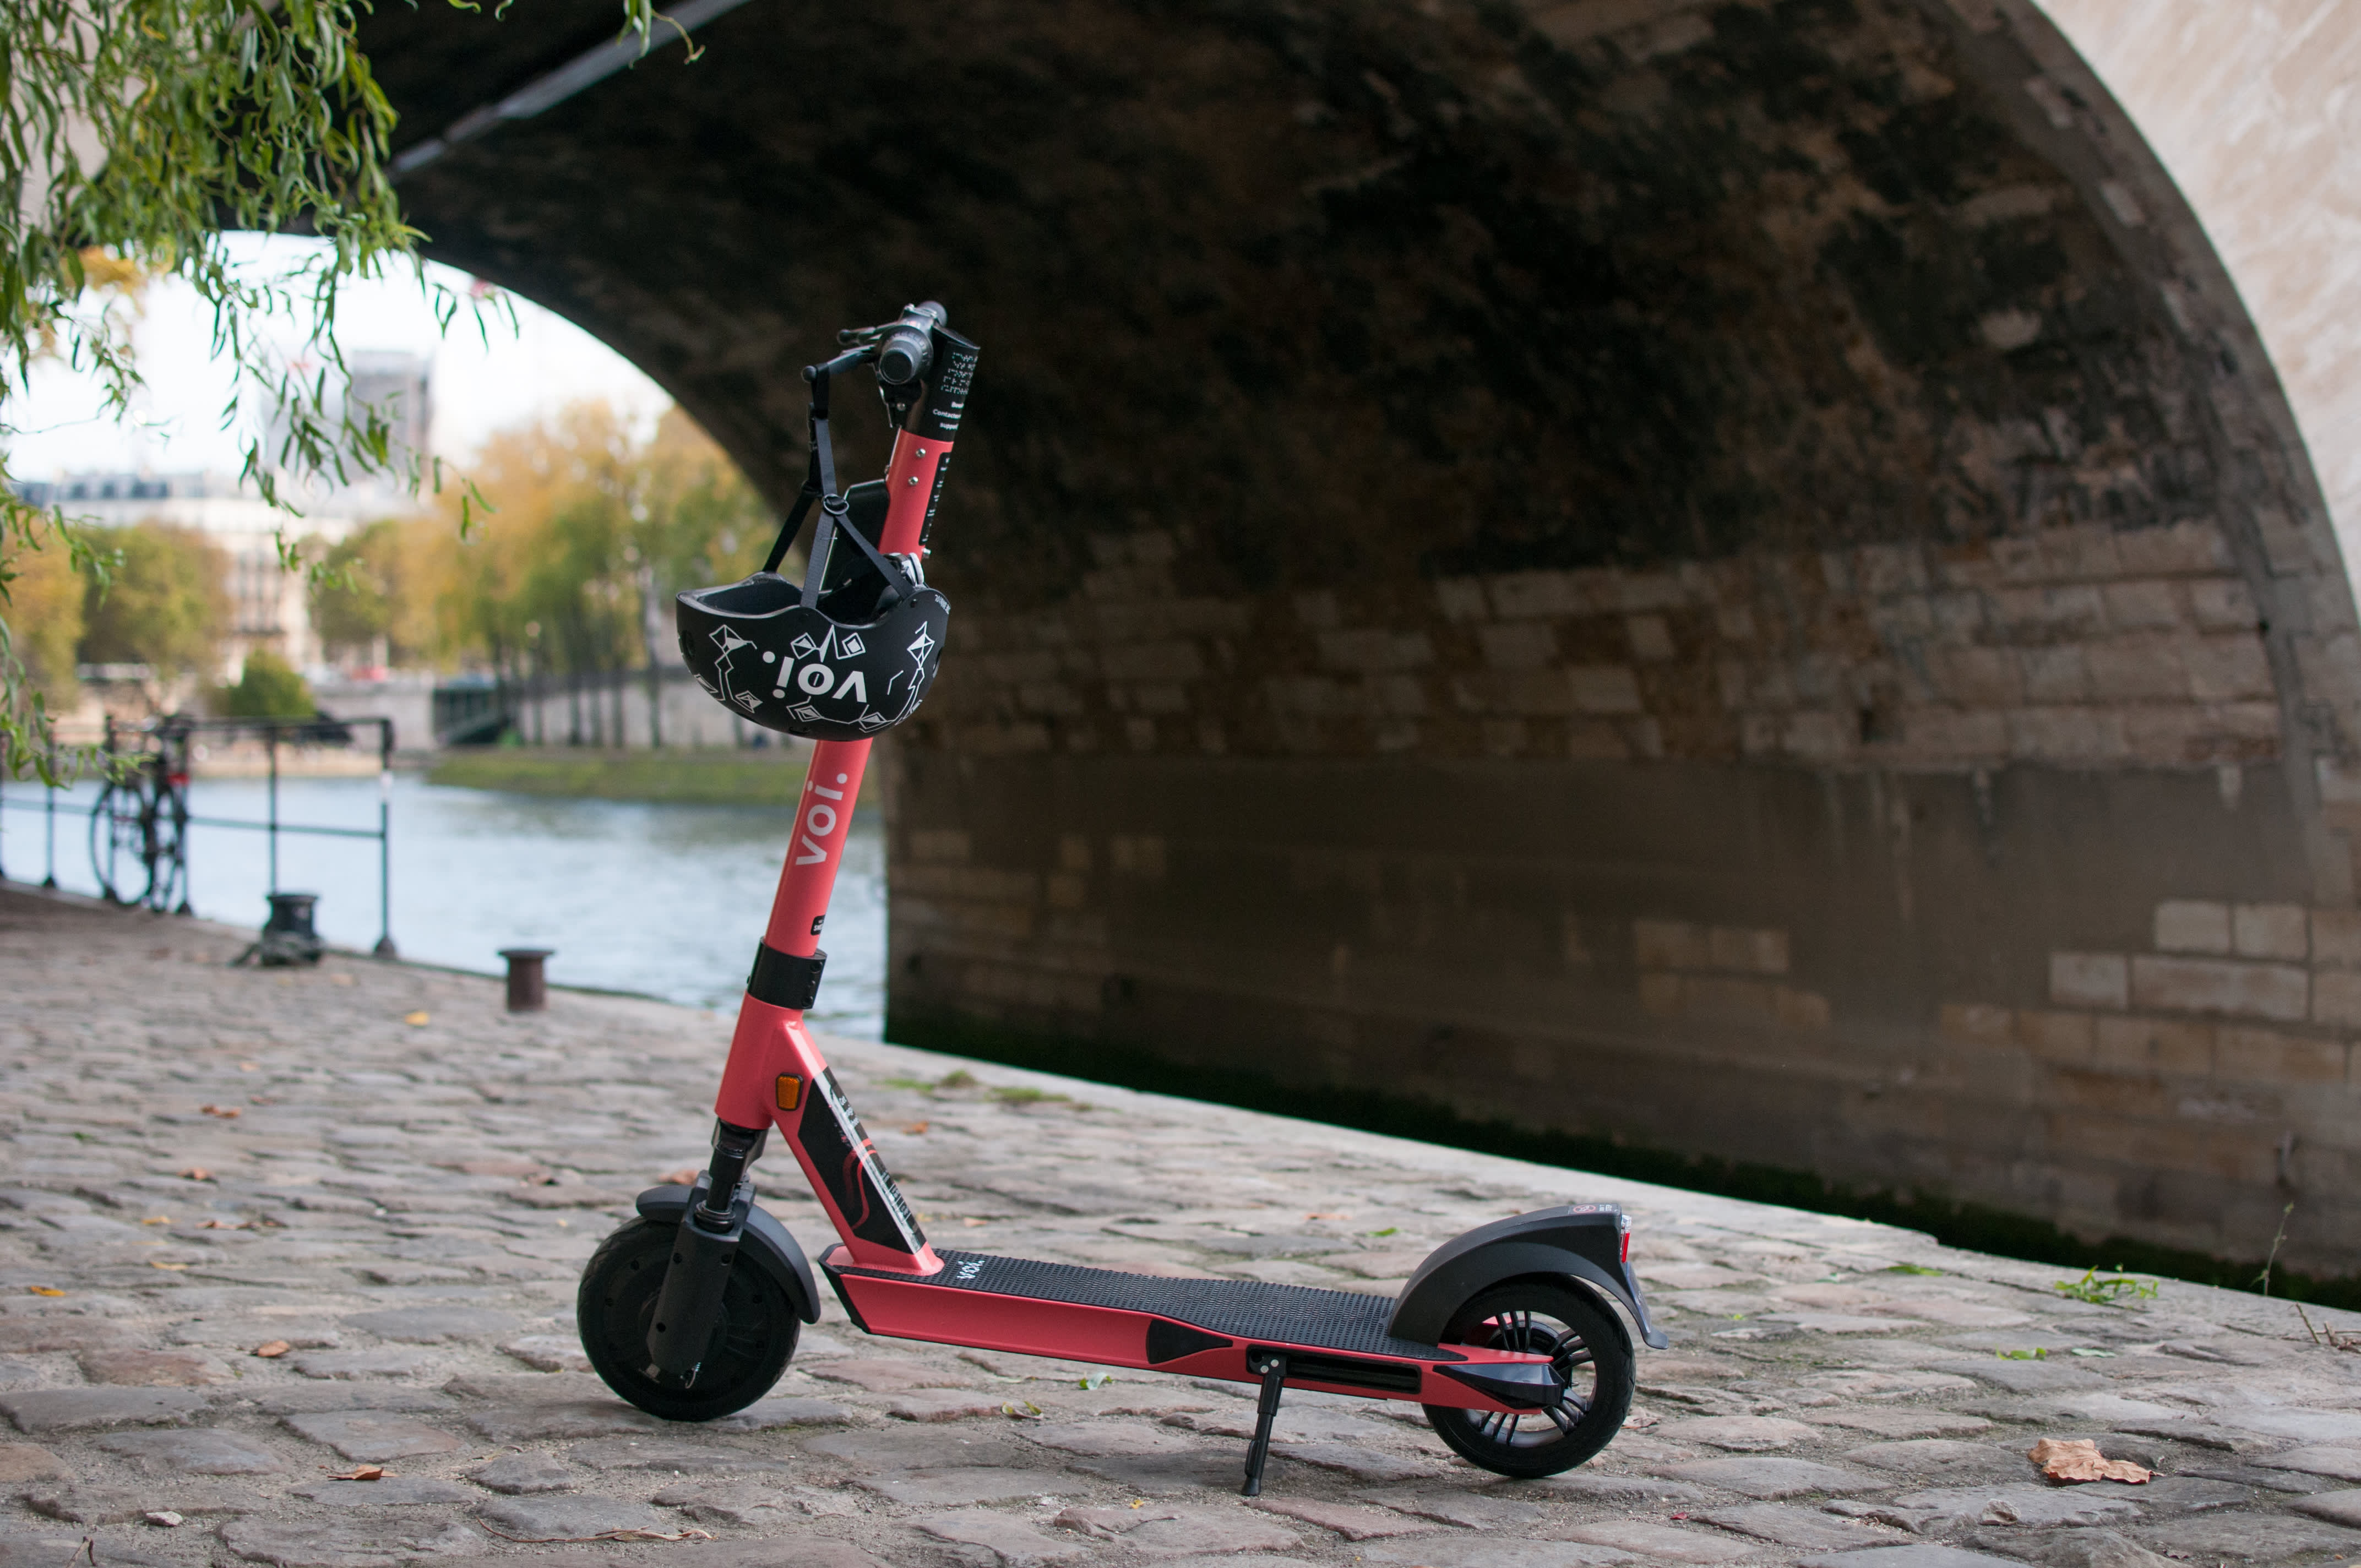 European e-scooter firm Voi raises $85 million in funding round